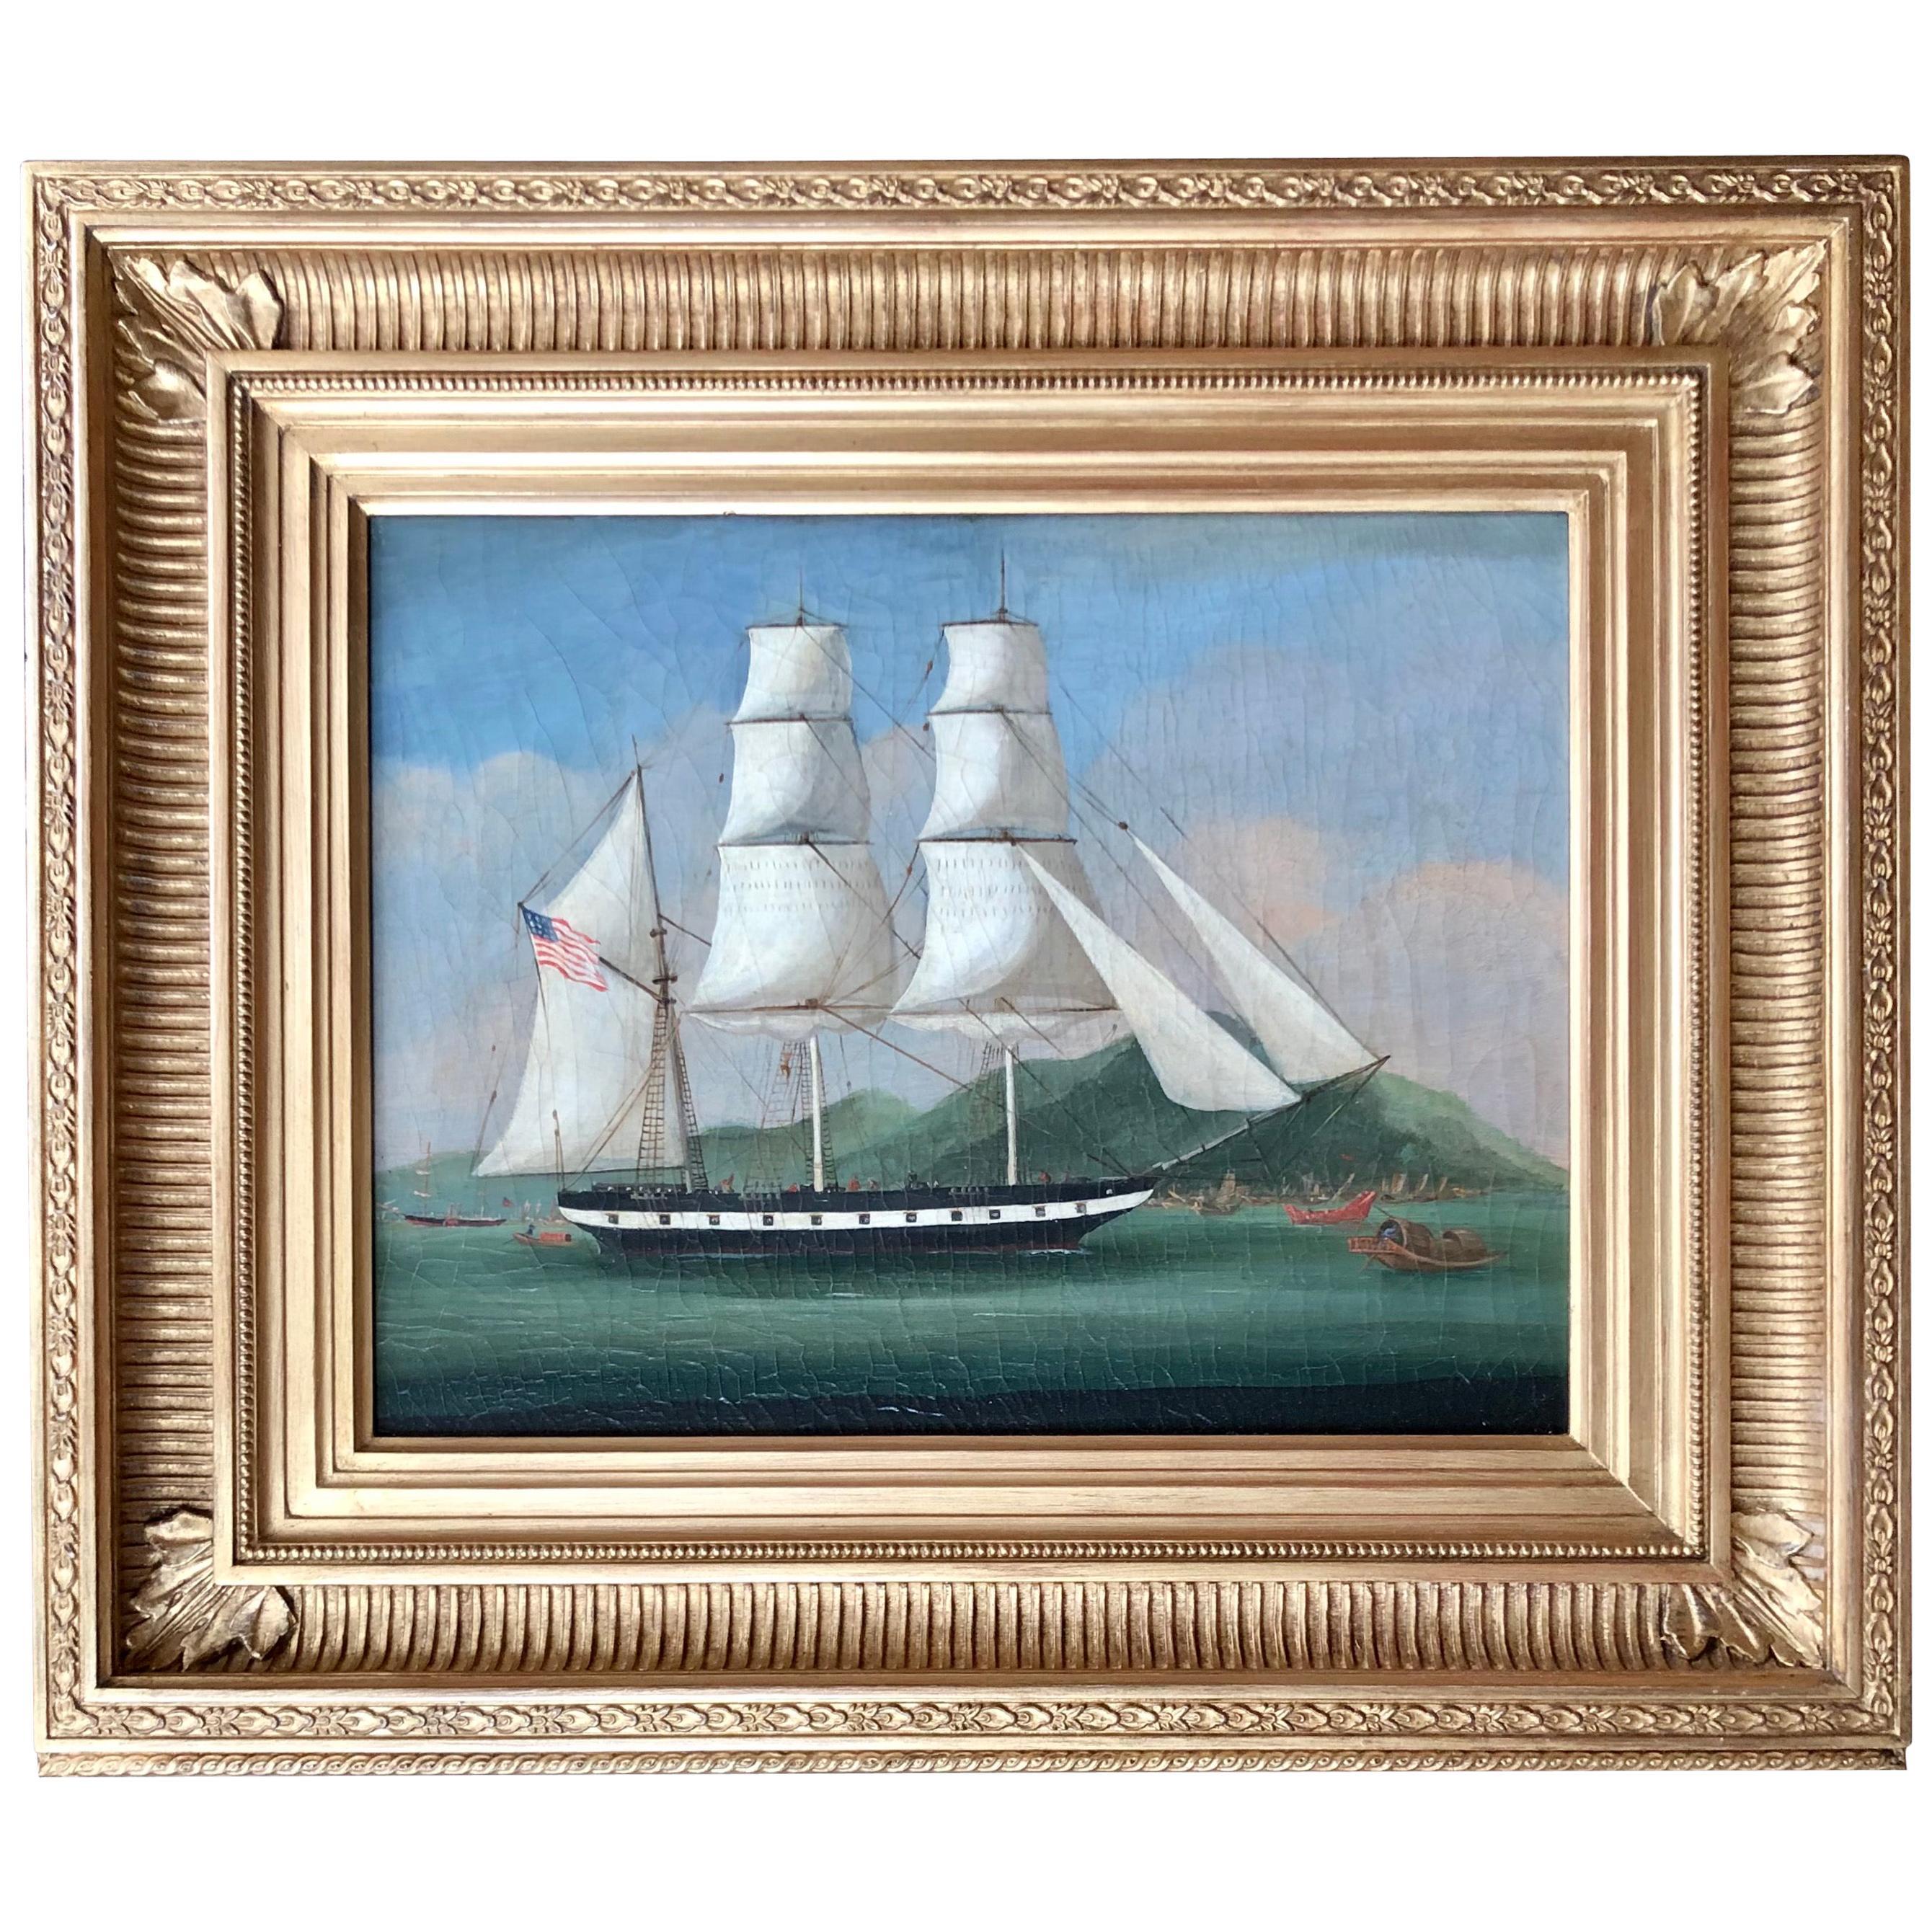 19th Century China Trade American Ship Painting